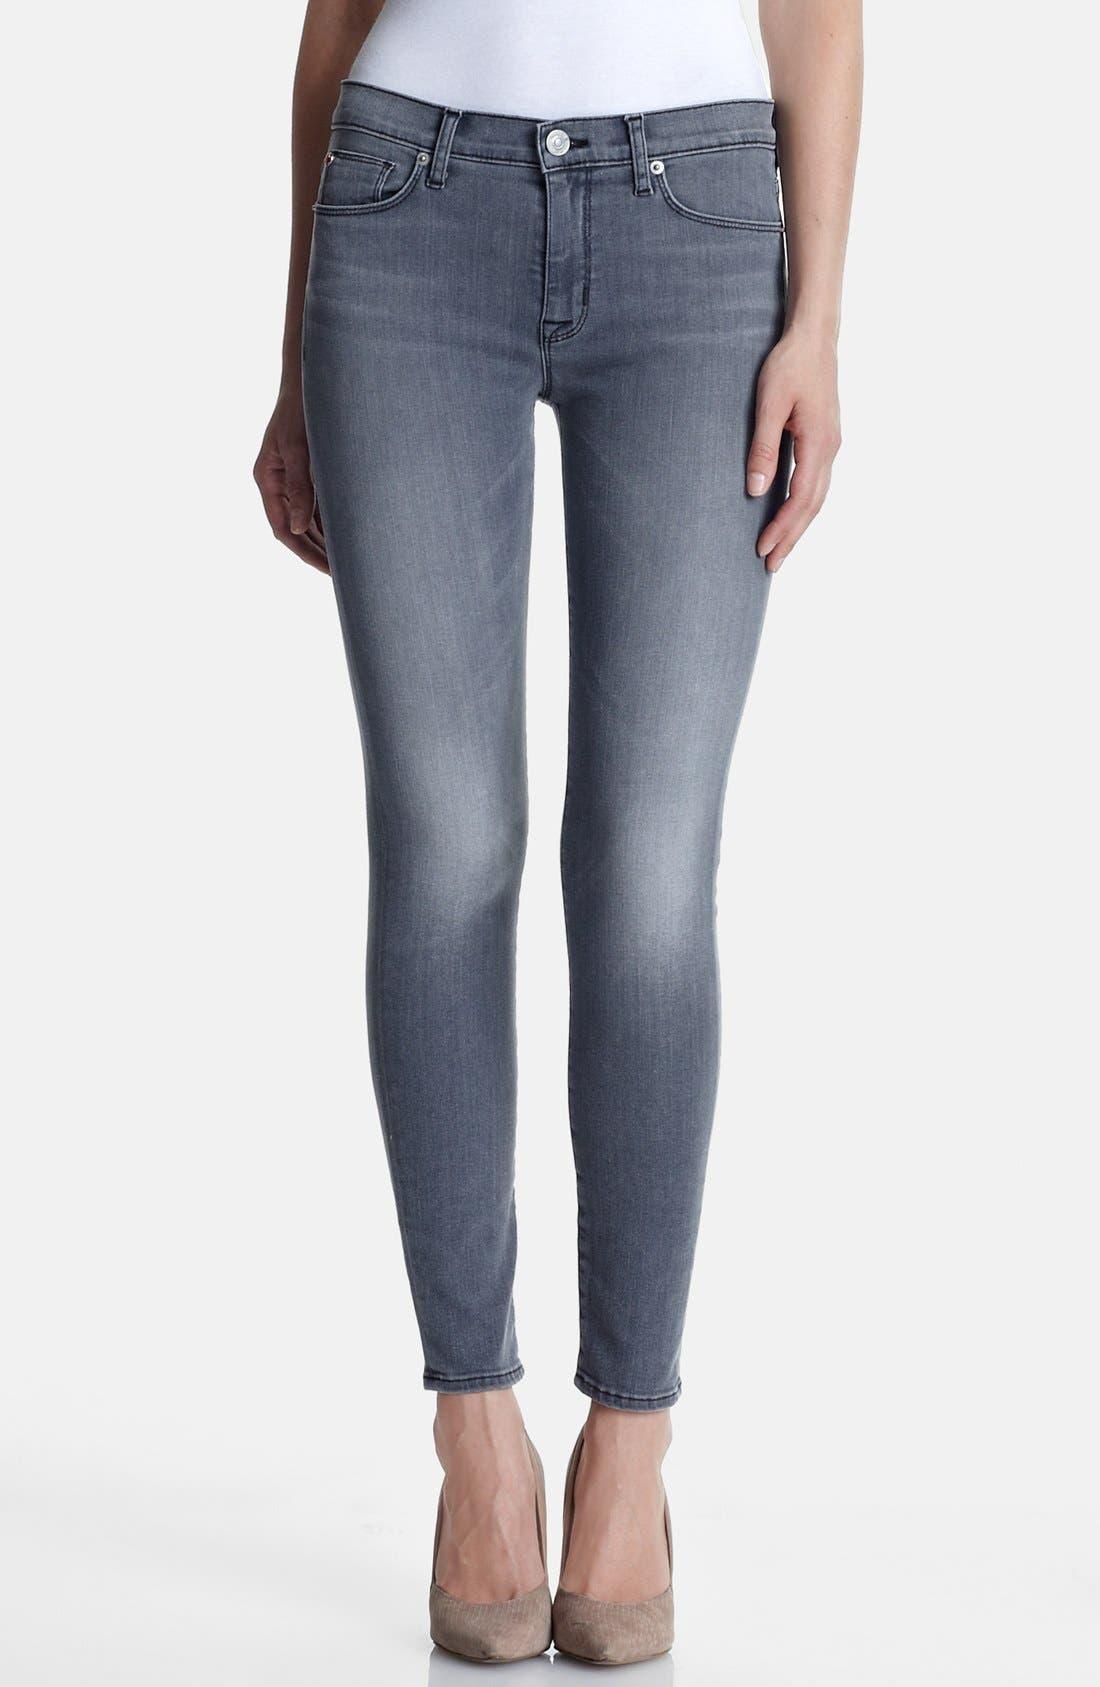 Main Image - Hudson Jeans 'Nico' Skinny Stretch Jeans (Rakke)